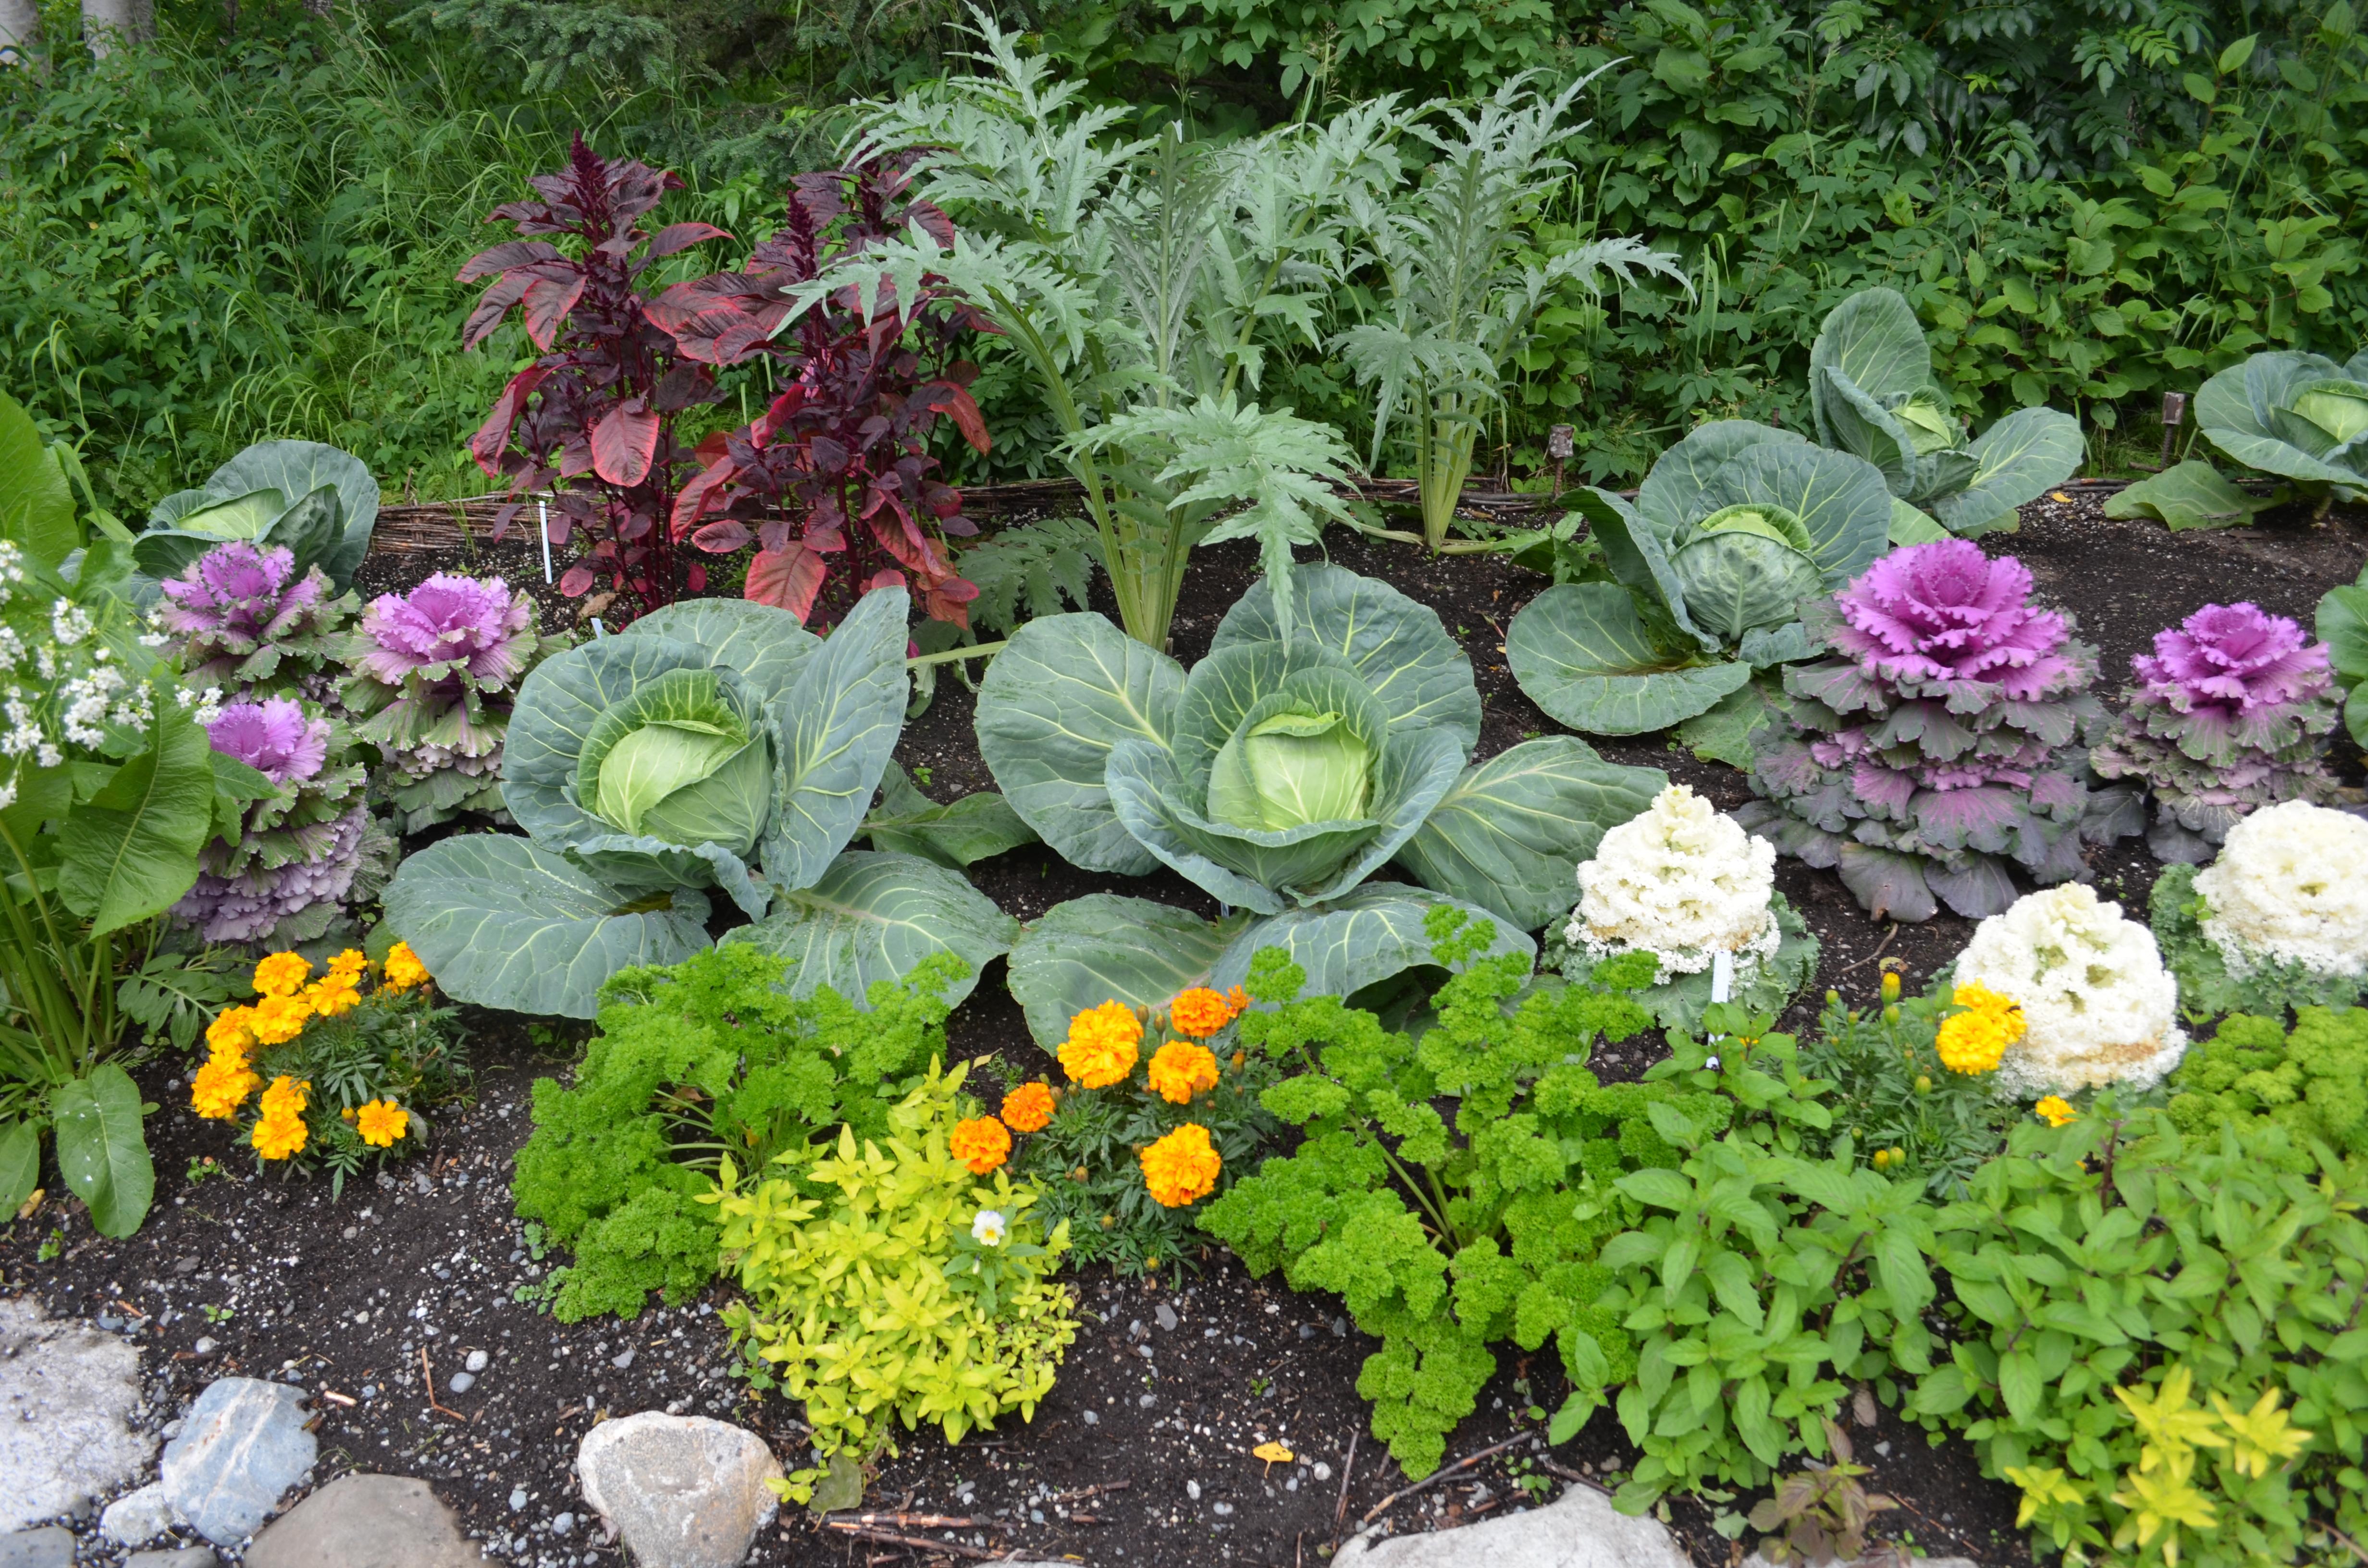 Fetching Flower Vegetable Garden Ideas Design Ideas Of Vegetable Garden Ideas Exellent Garden Design Vegetables Andflowers Container Ideas Flower garden Vegetable Garden Planters Ideas